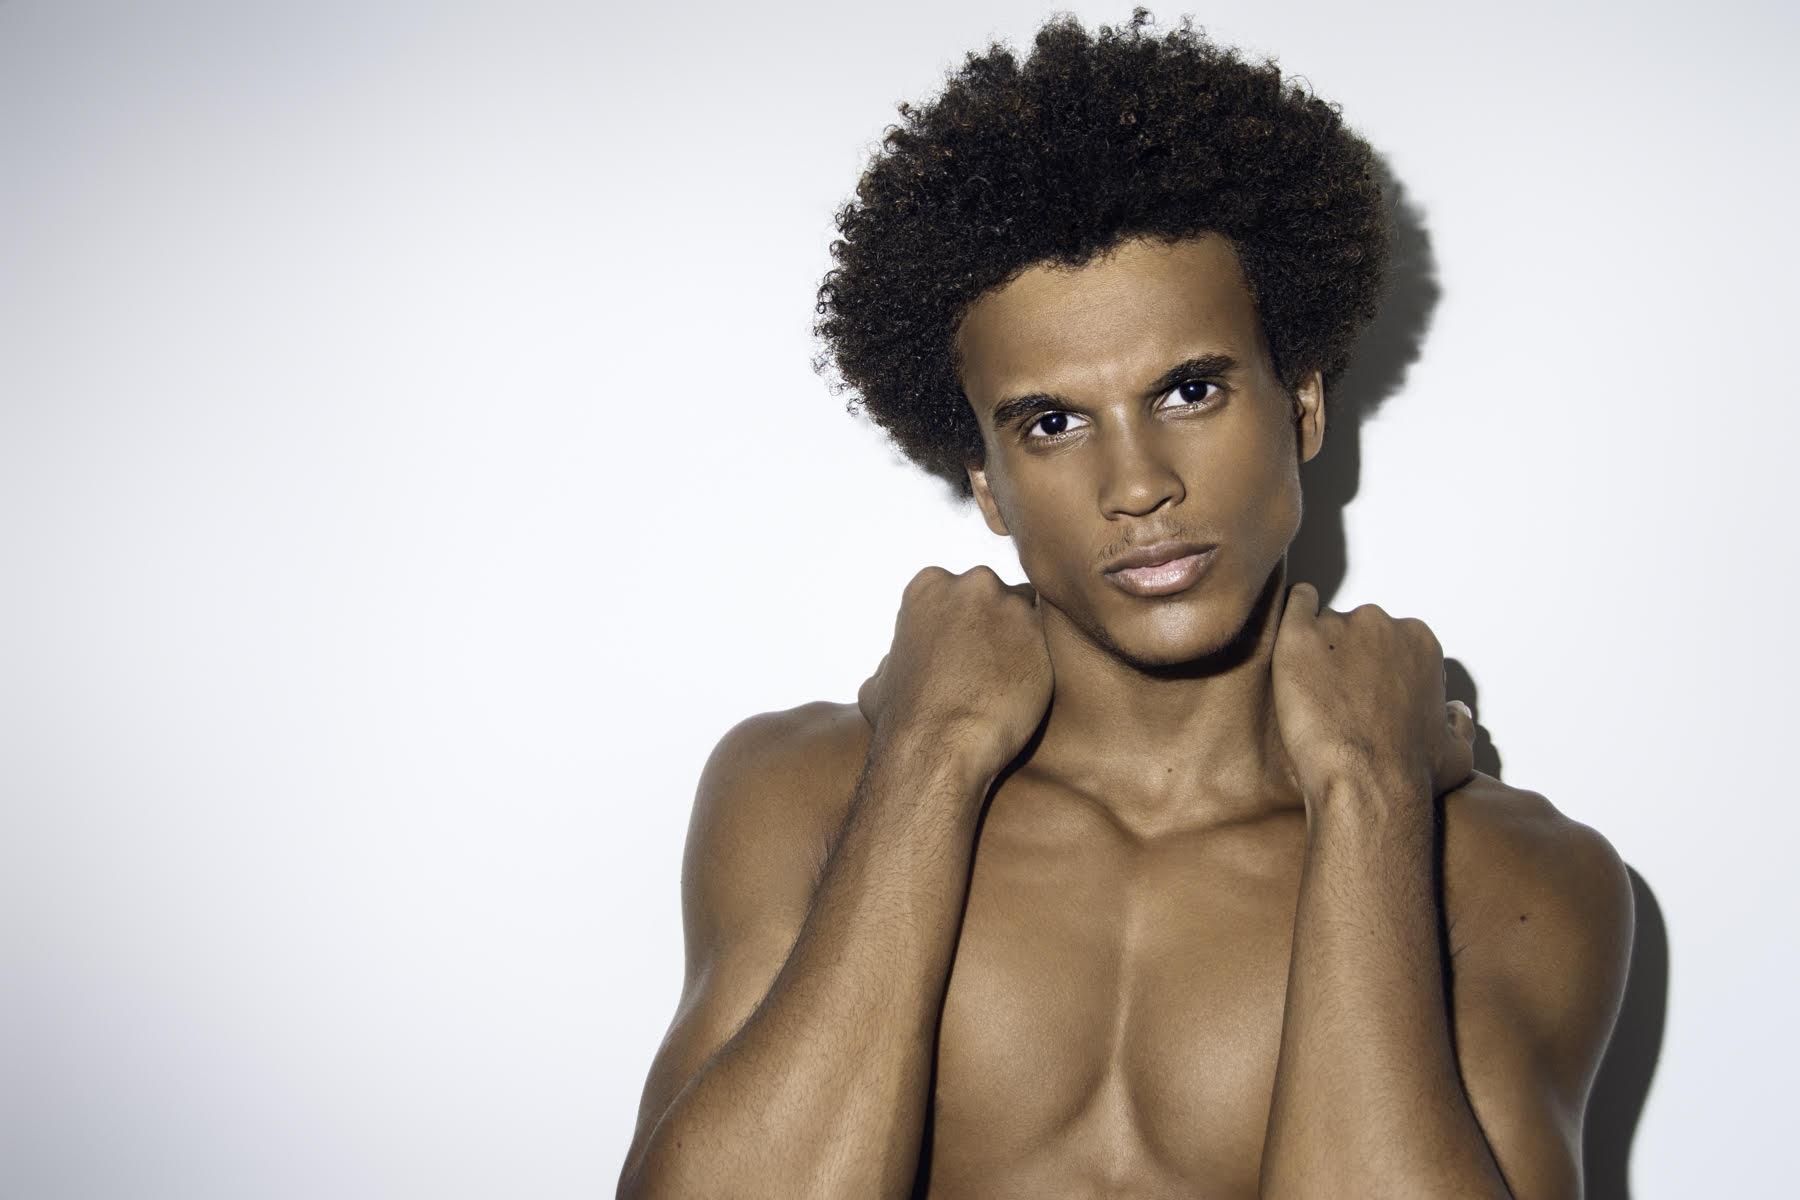 Taylor Romão by Dario Scala for Brazilian Male Model